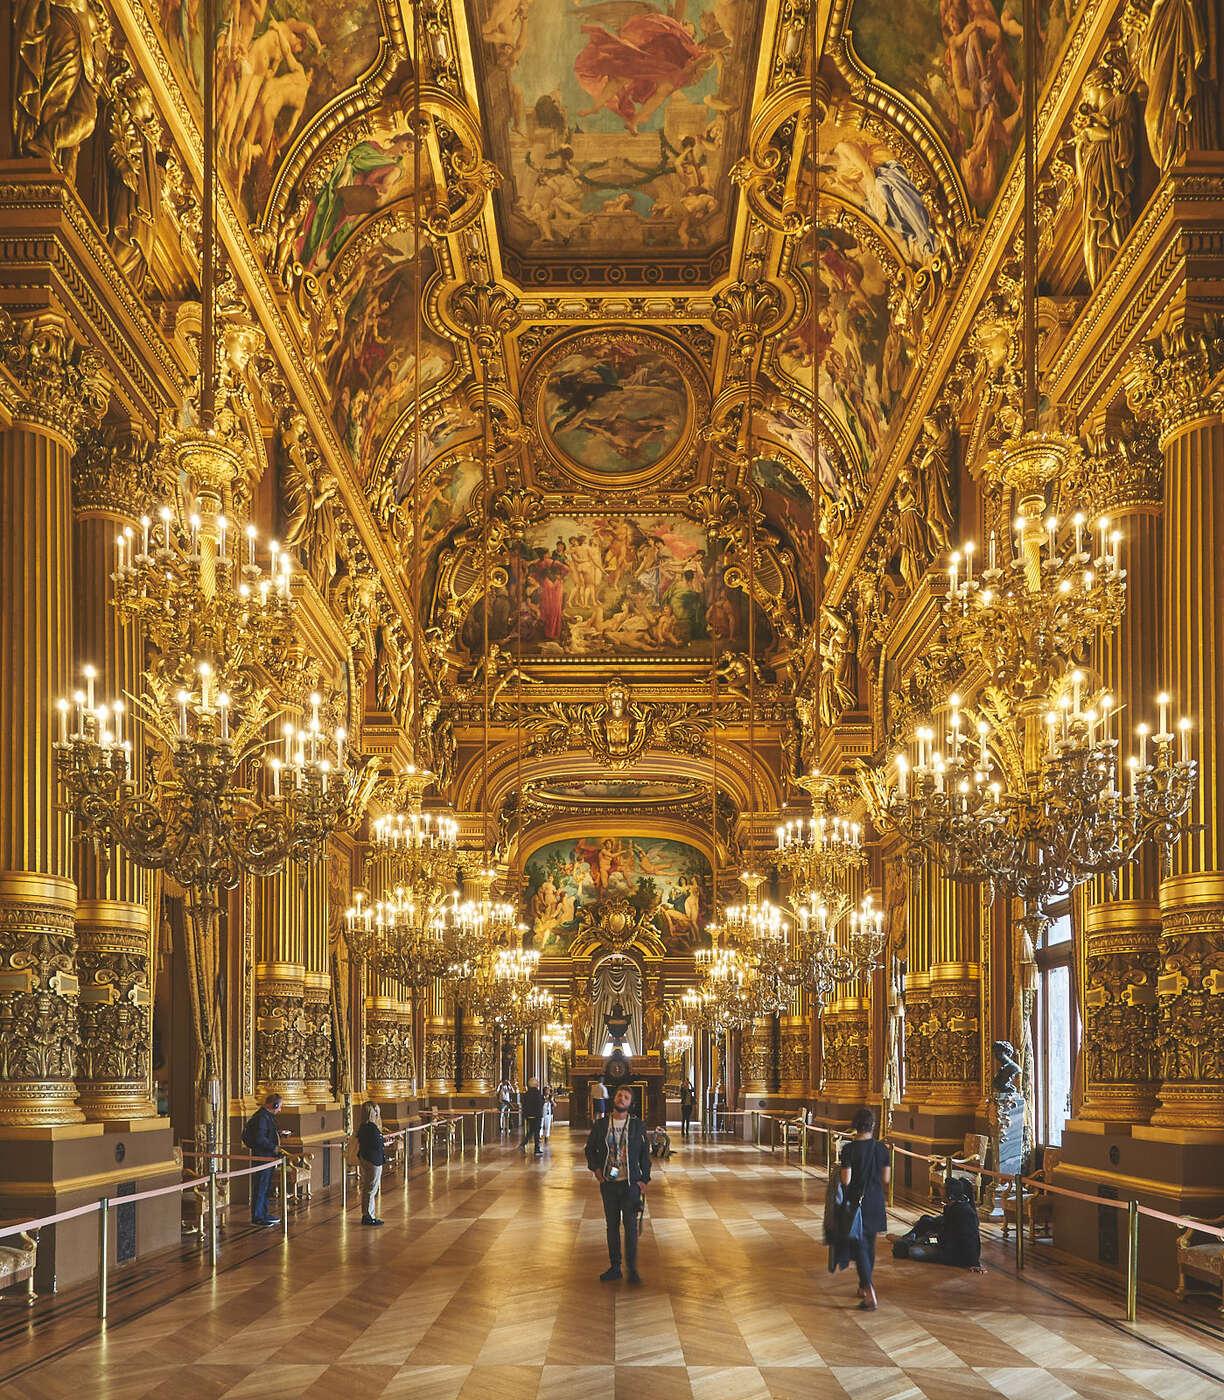 Grande galerie de l'Opéra Garnier